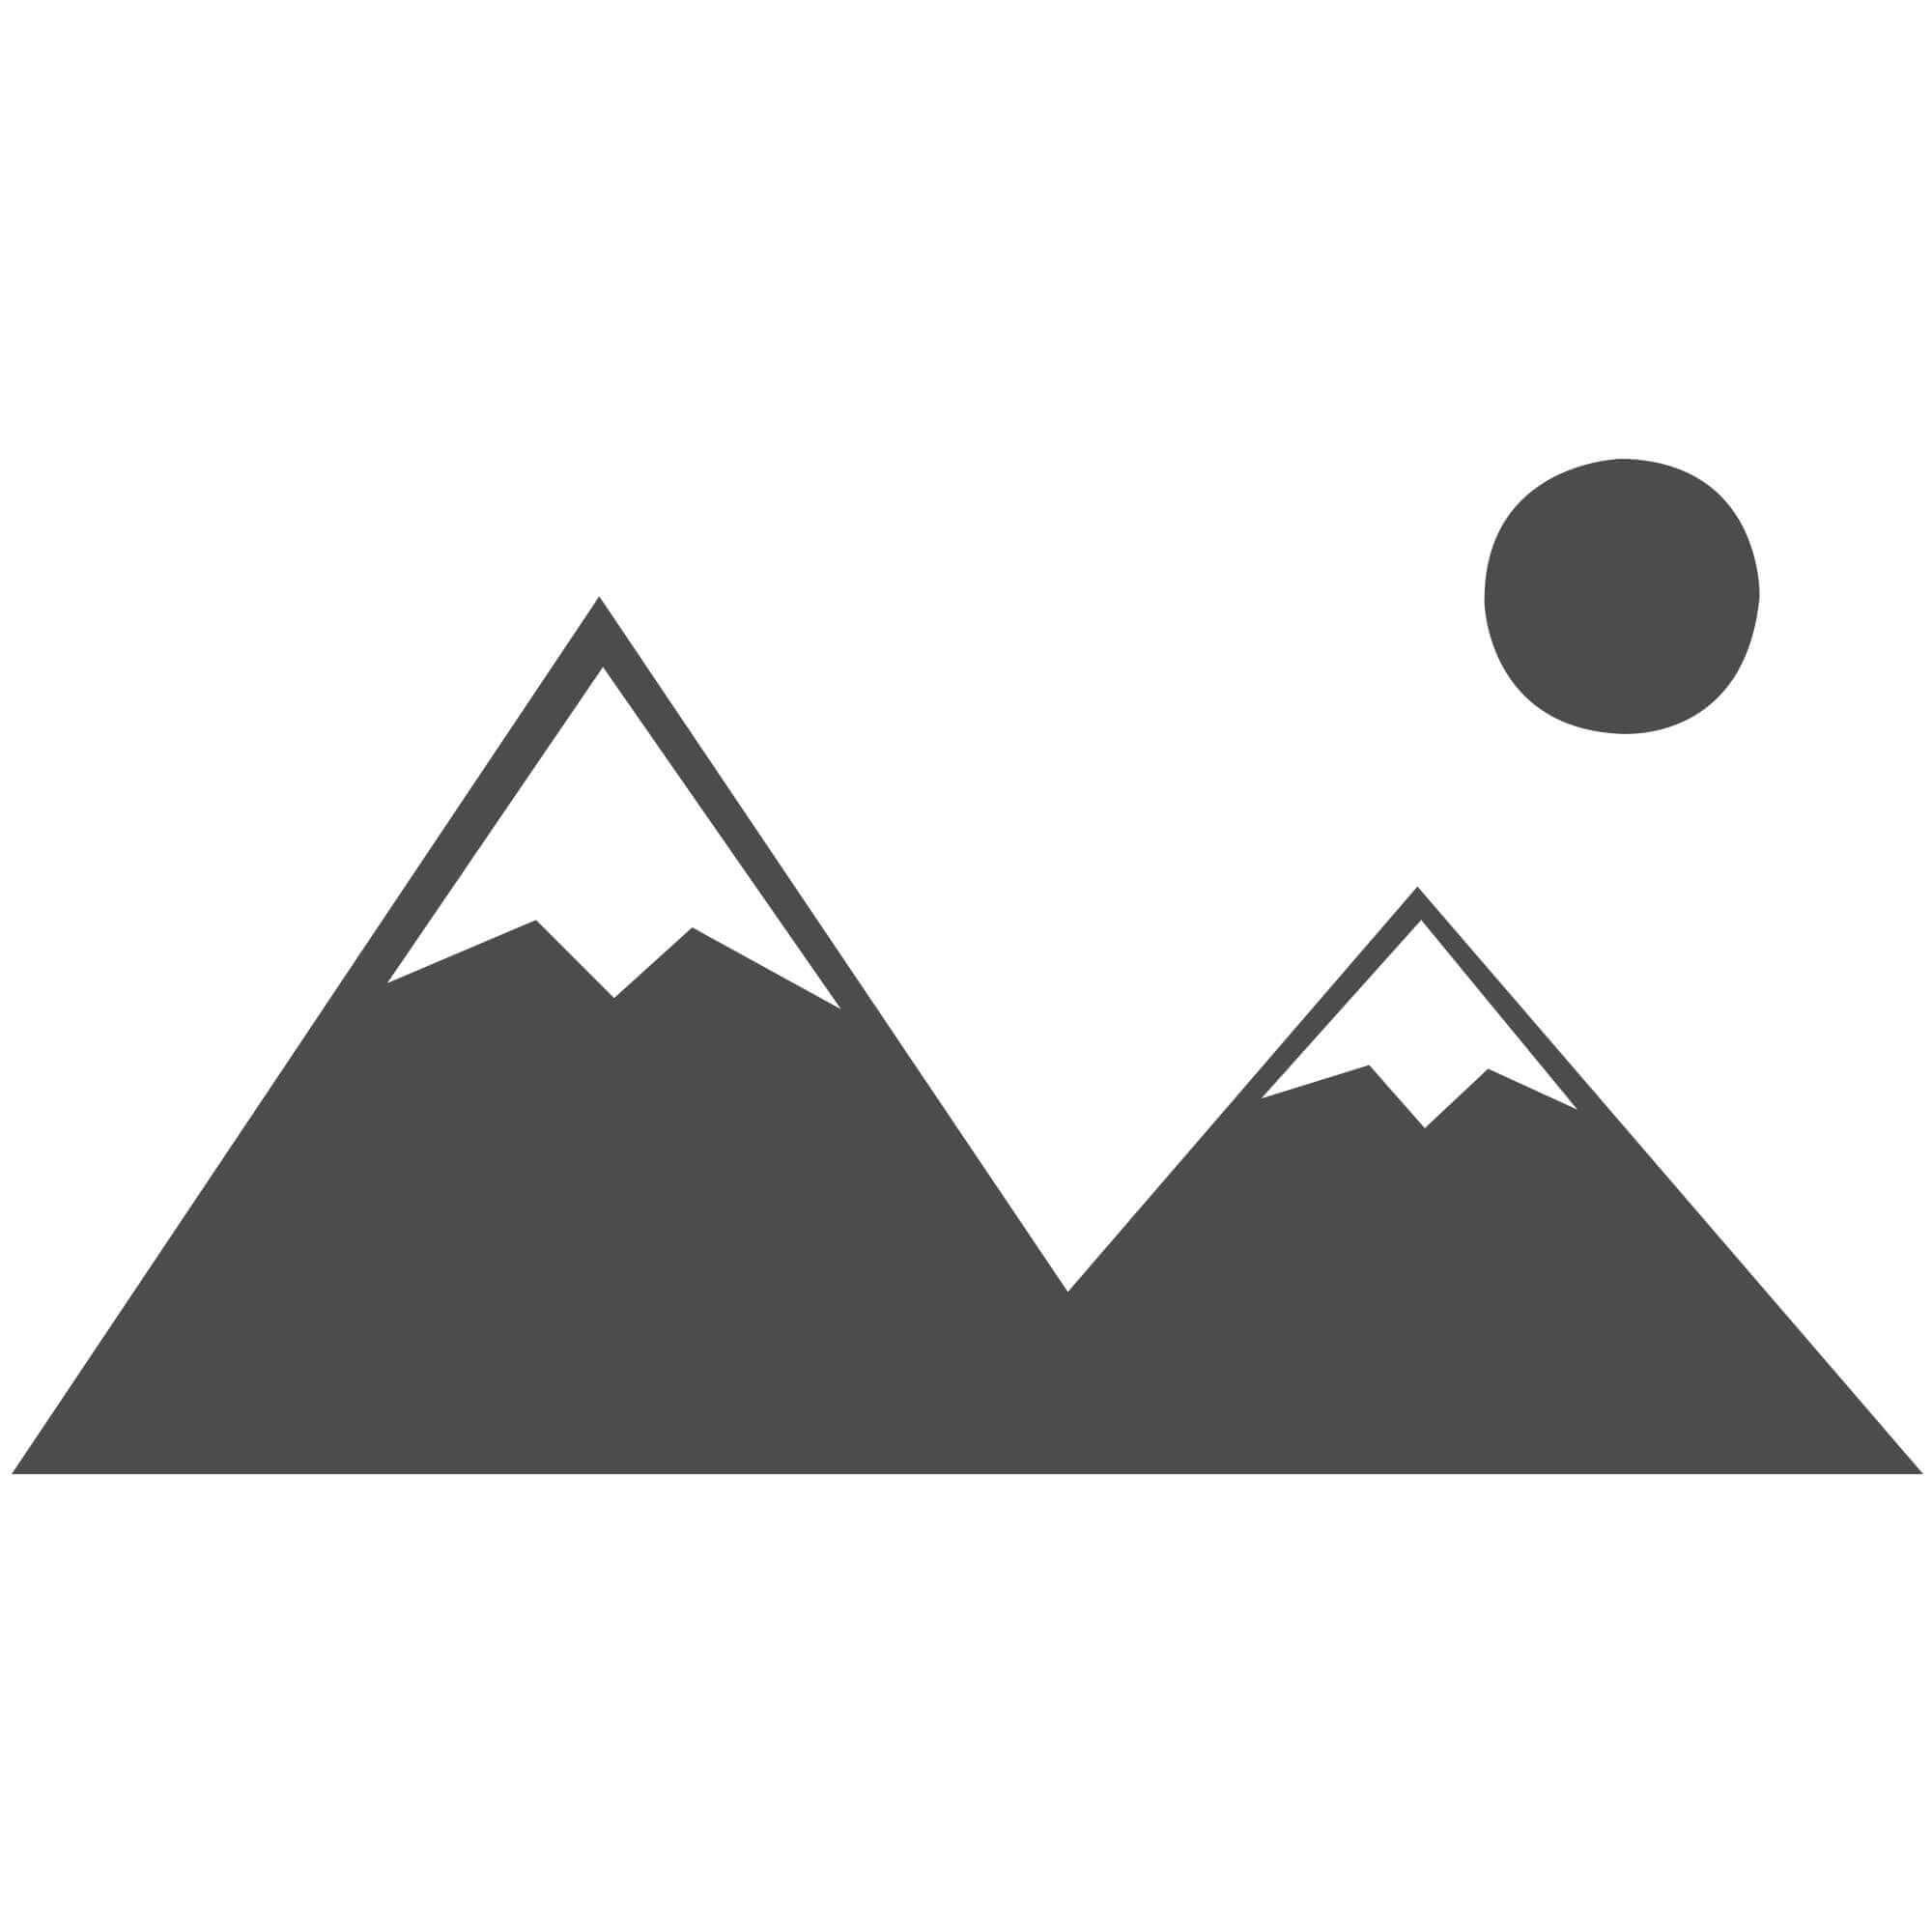 "Shatter Rug - Beige Brown - Size 200 x 290 cm (6'7"" x 9'6"")"